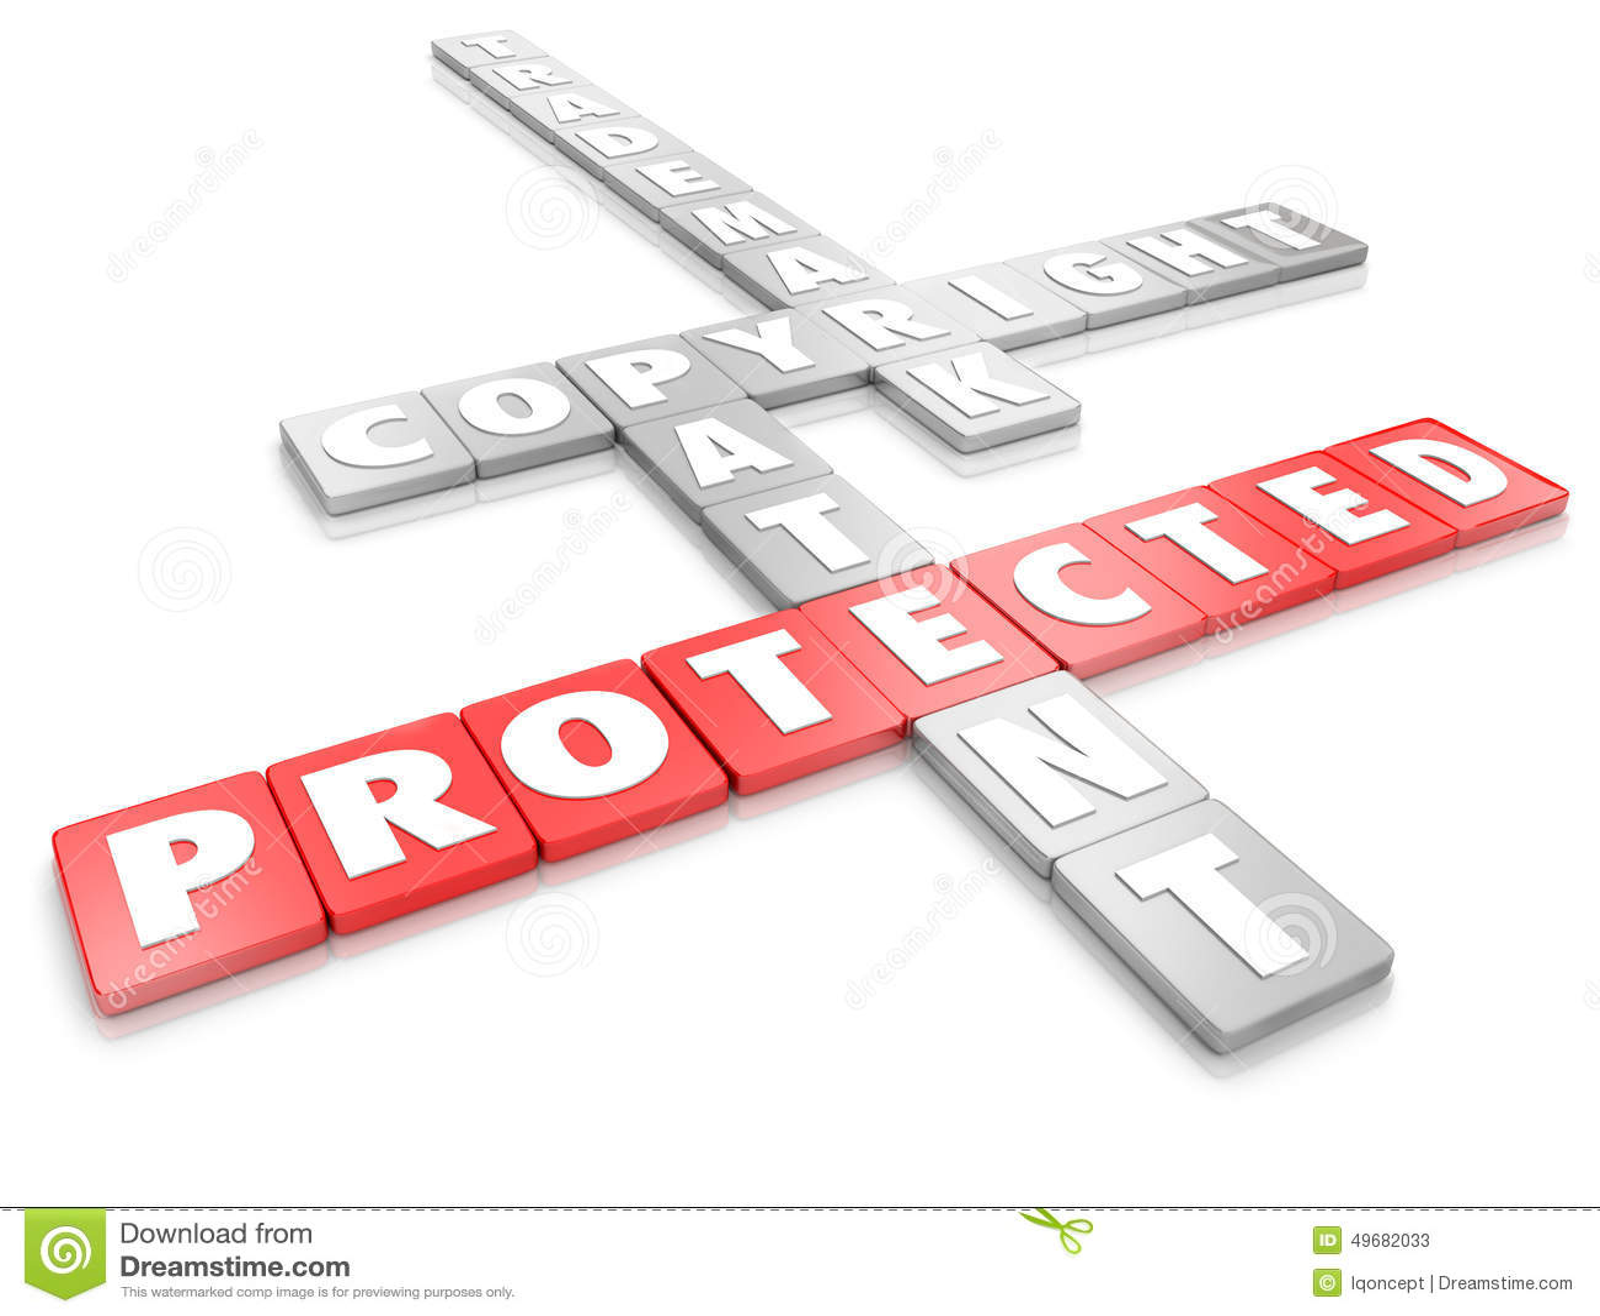 Intellectual Property Architecture